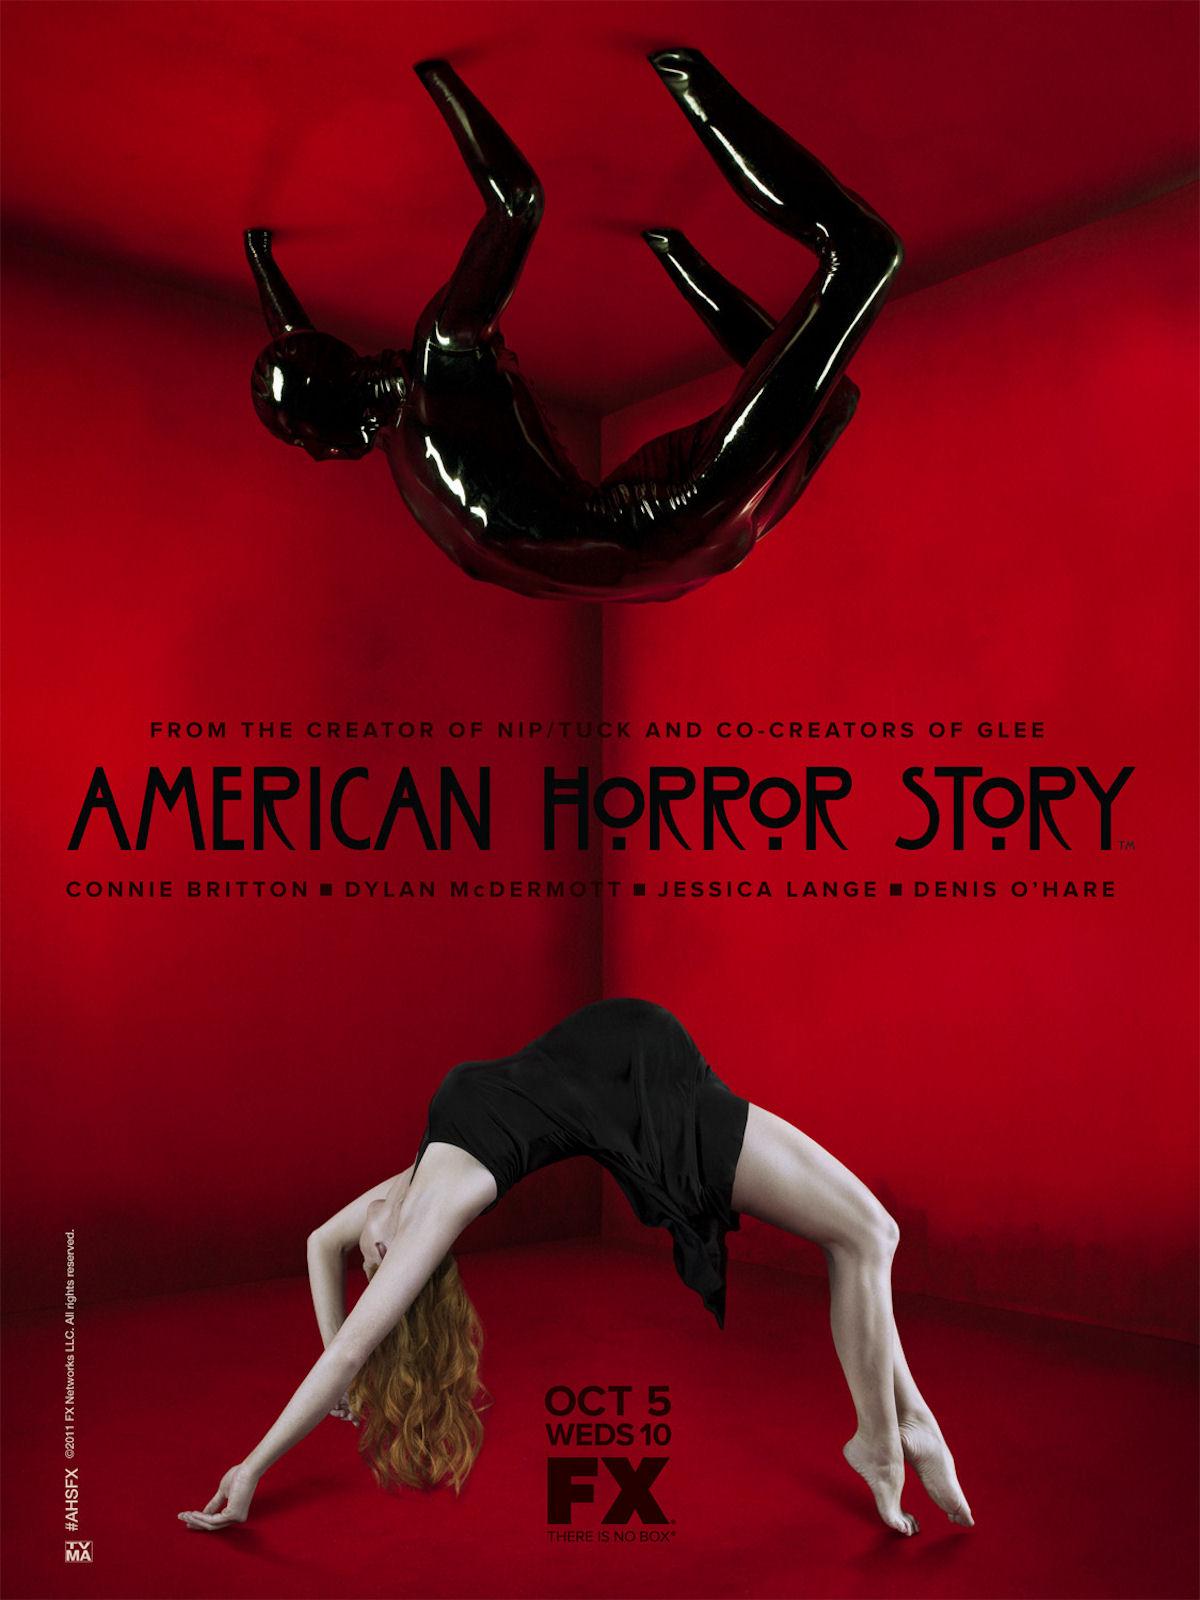 http://1.bp.blogspot.com/-9OiWpJ-YY3I/Tn749CZsDpI/AAAAAAAAEyk/GpeulrTfp-E/s1600/American-Horror-Story-Poster.jpg